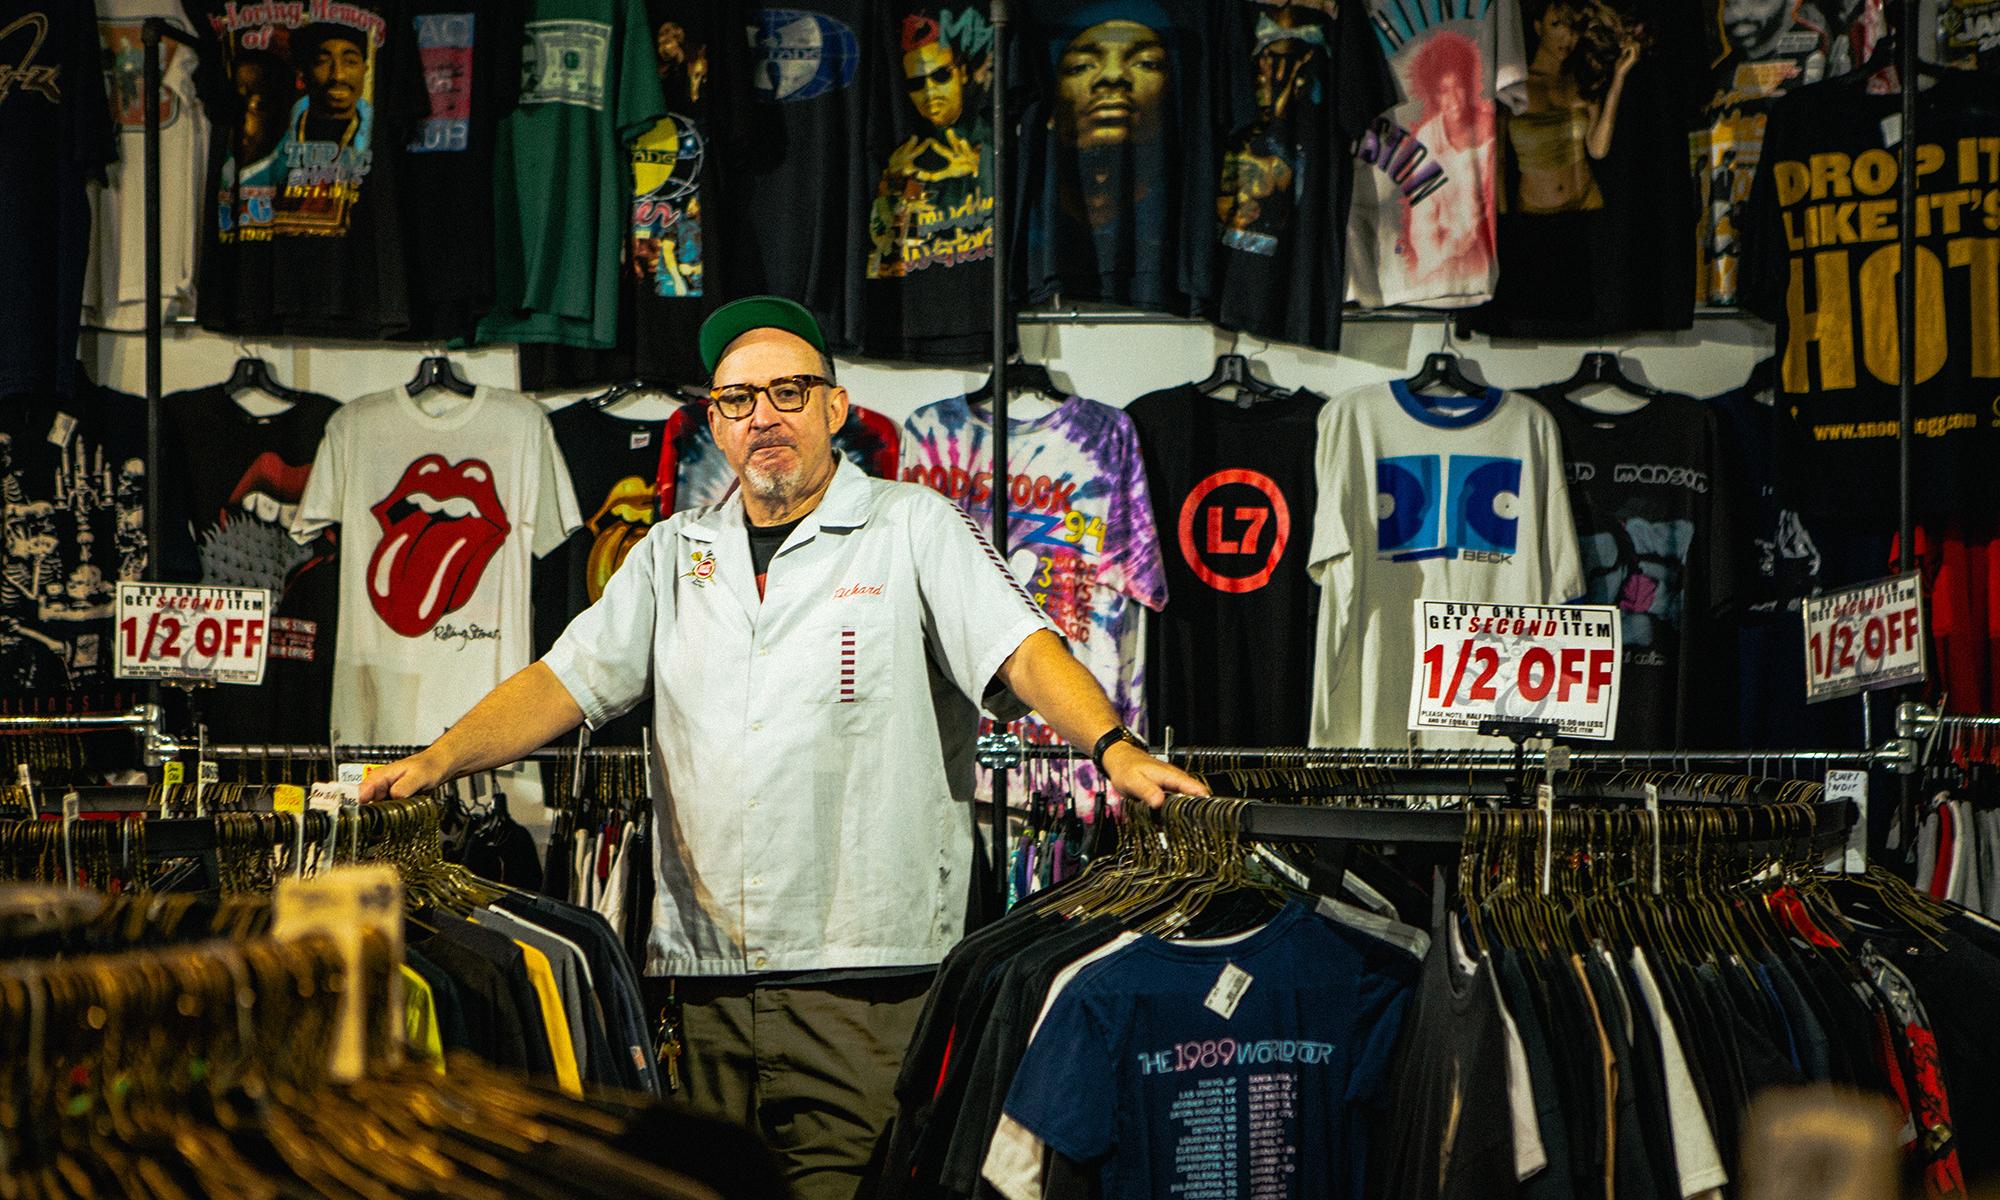 这家店放着 3,000 多件古着 T-Shirt,也许还能偶遇 Kanye West